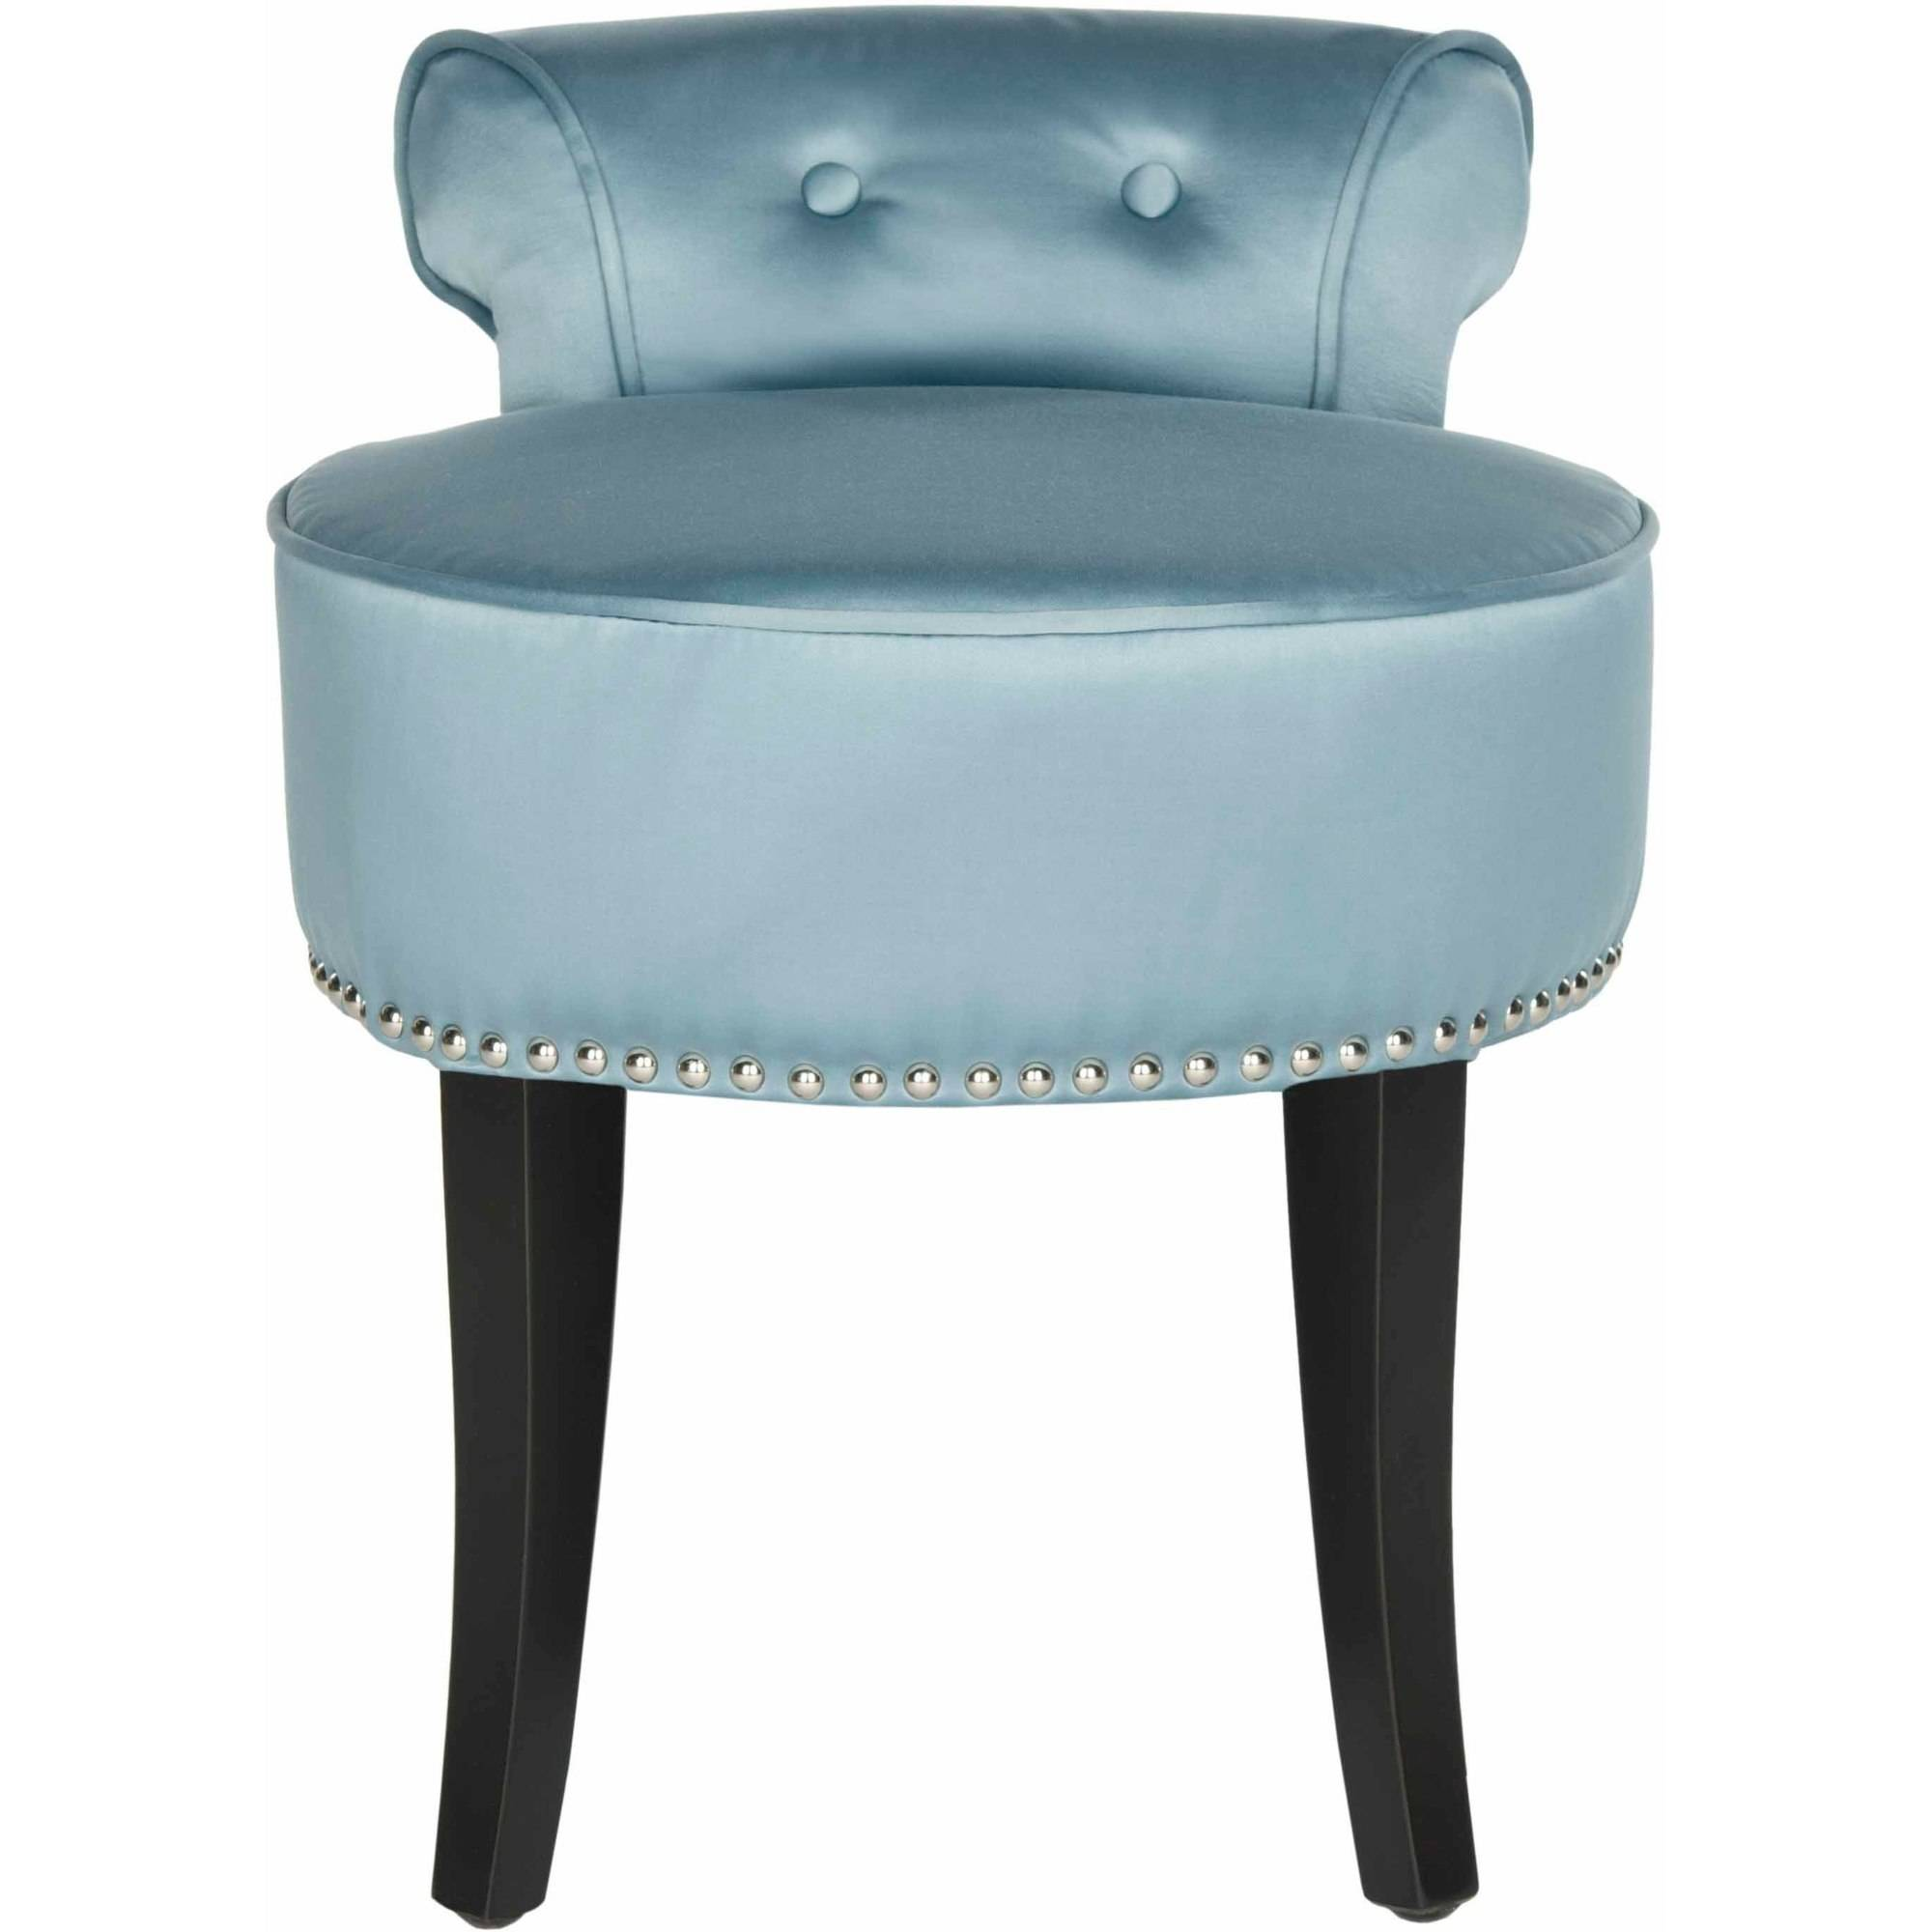 Safavieh Georgia Vanity Stool Walmartcom - Bathroom vanity chair or stool